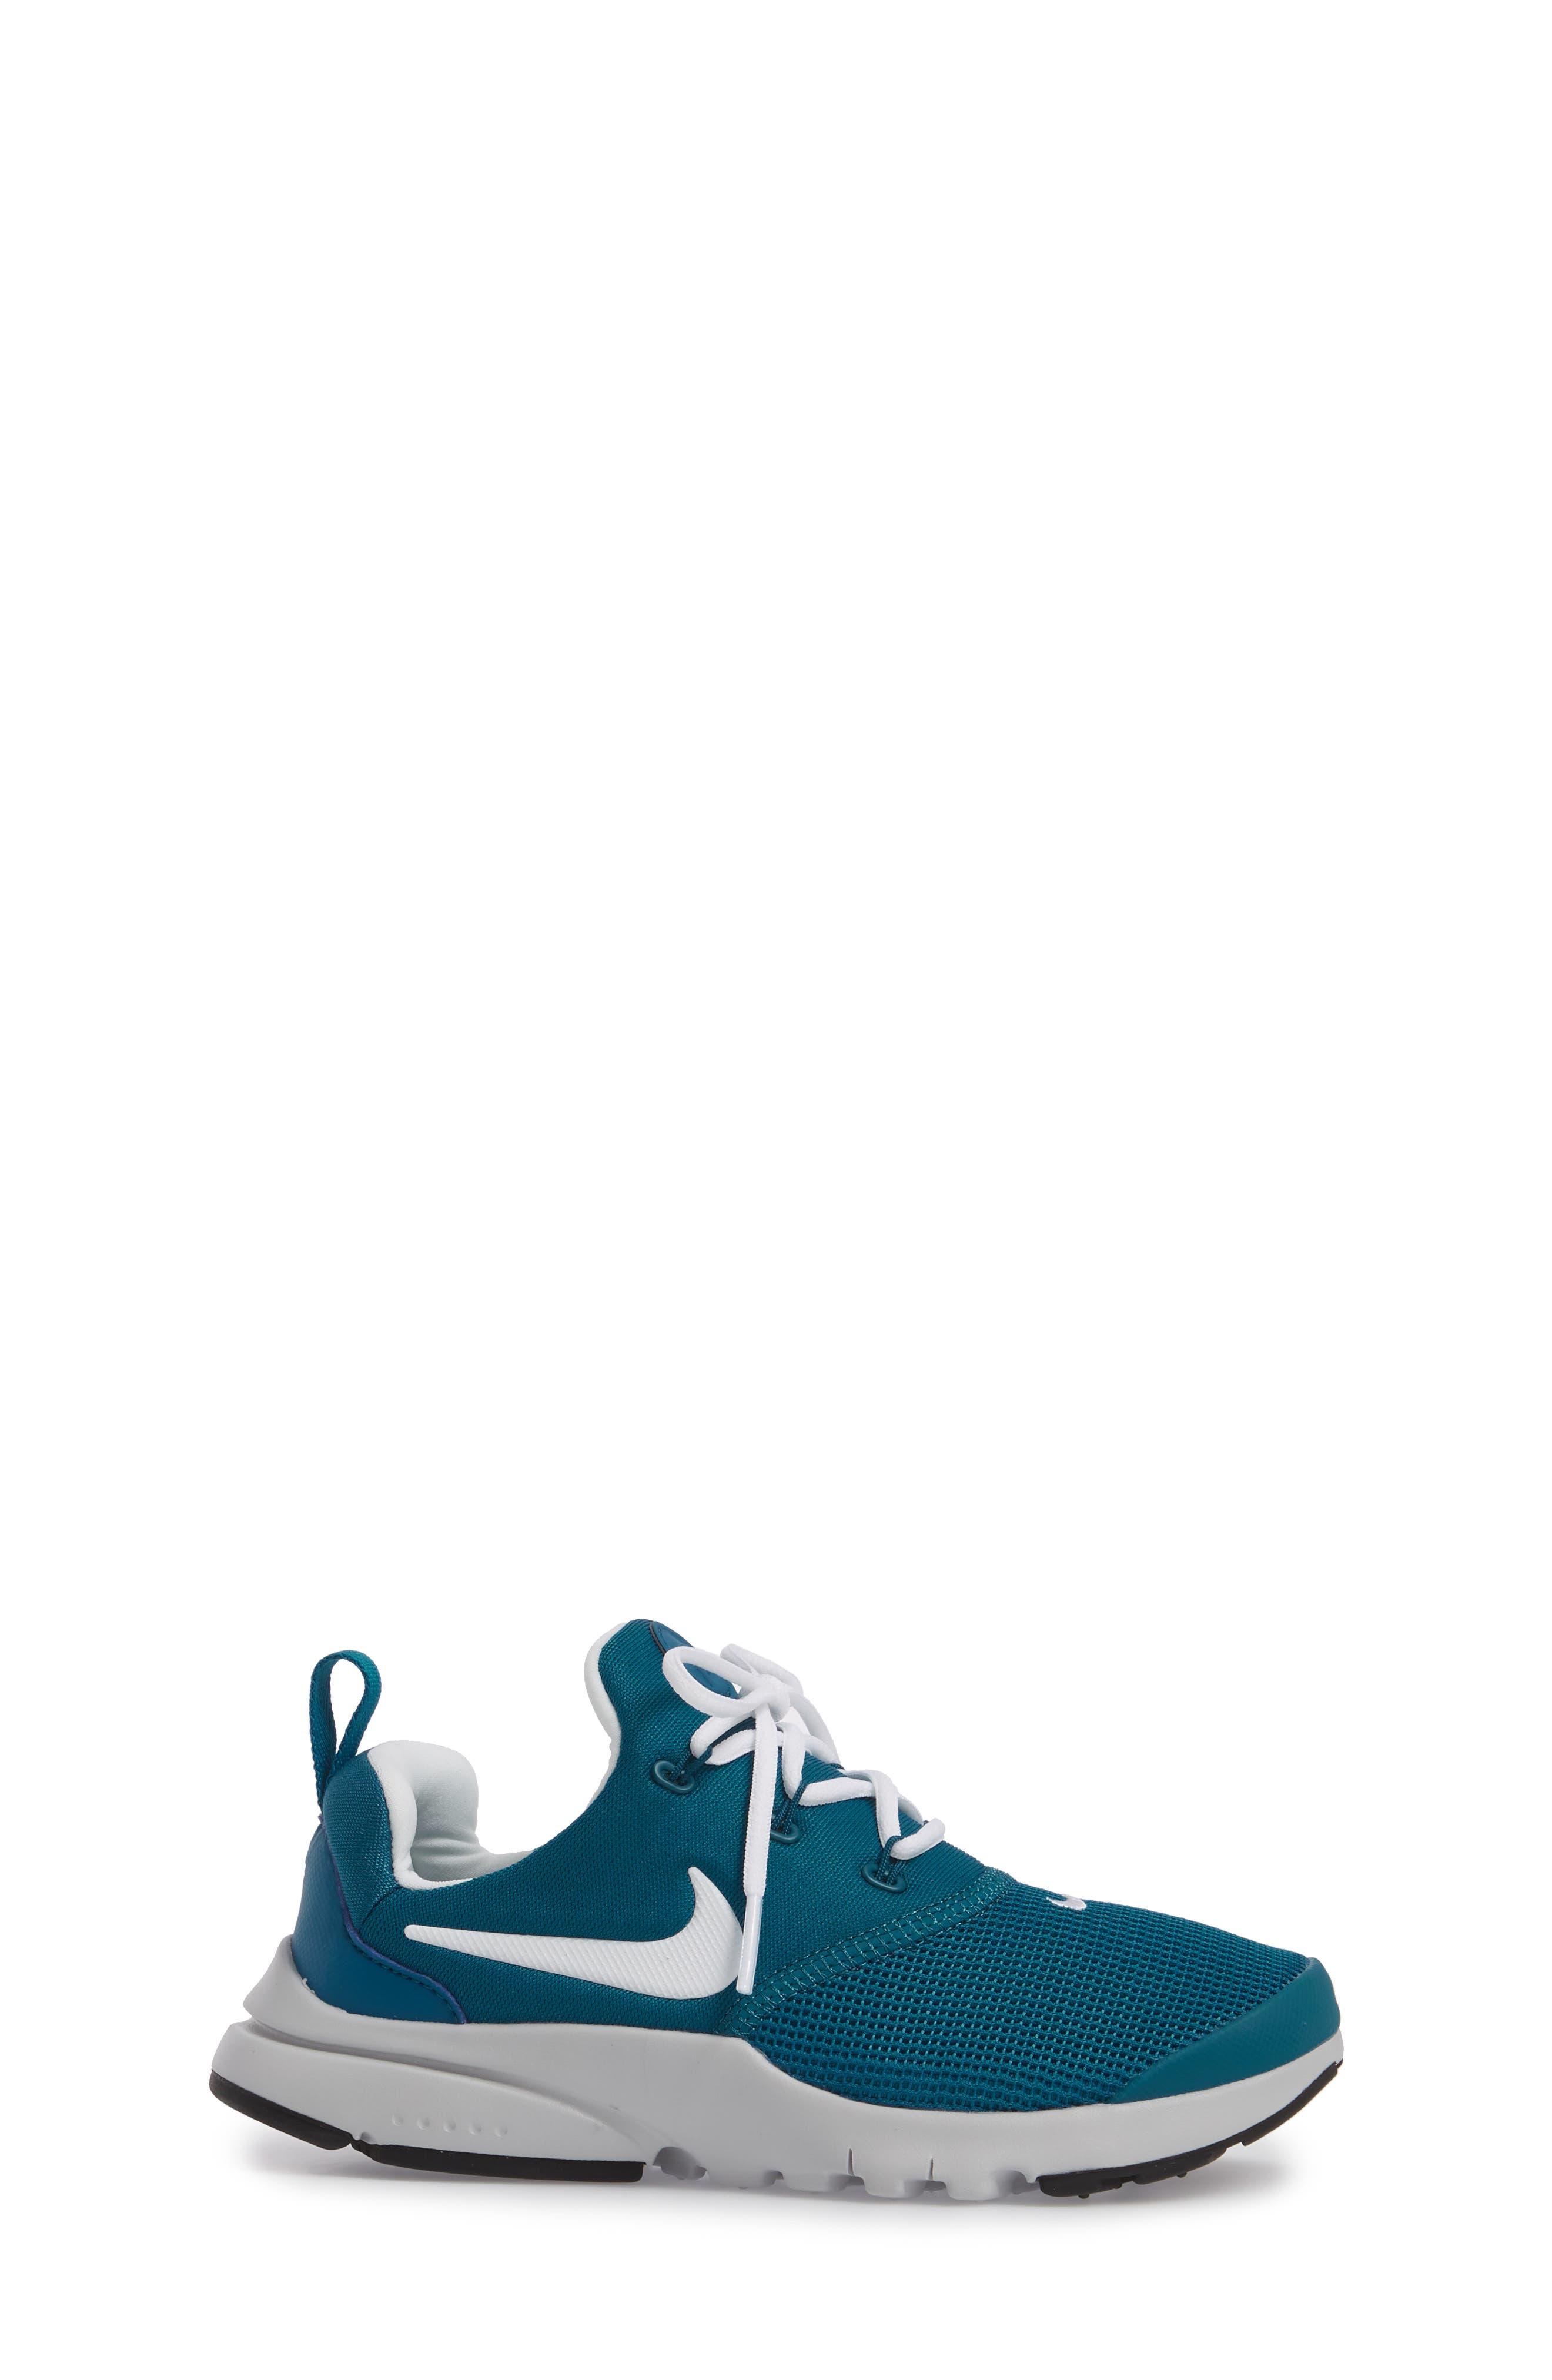 Presto Fly Sneaker,                             Alternate thumbnail 3, color,                             440